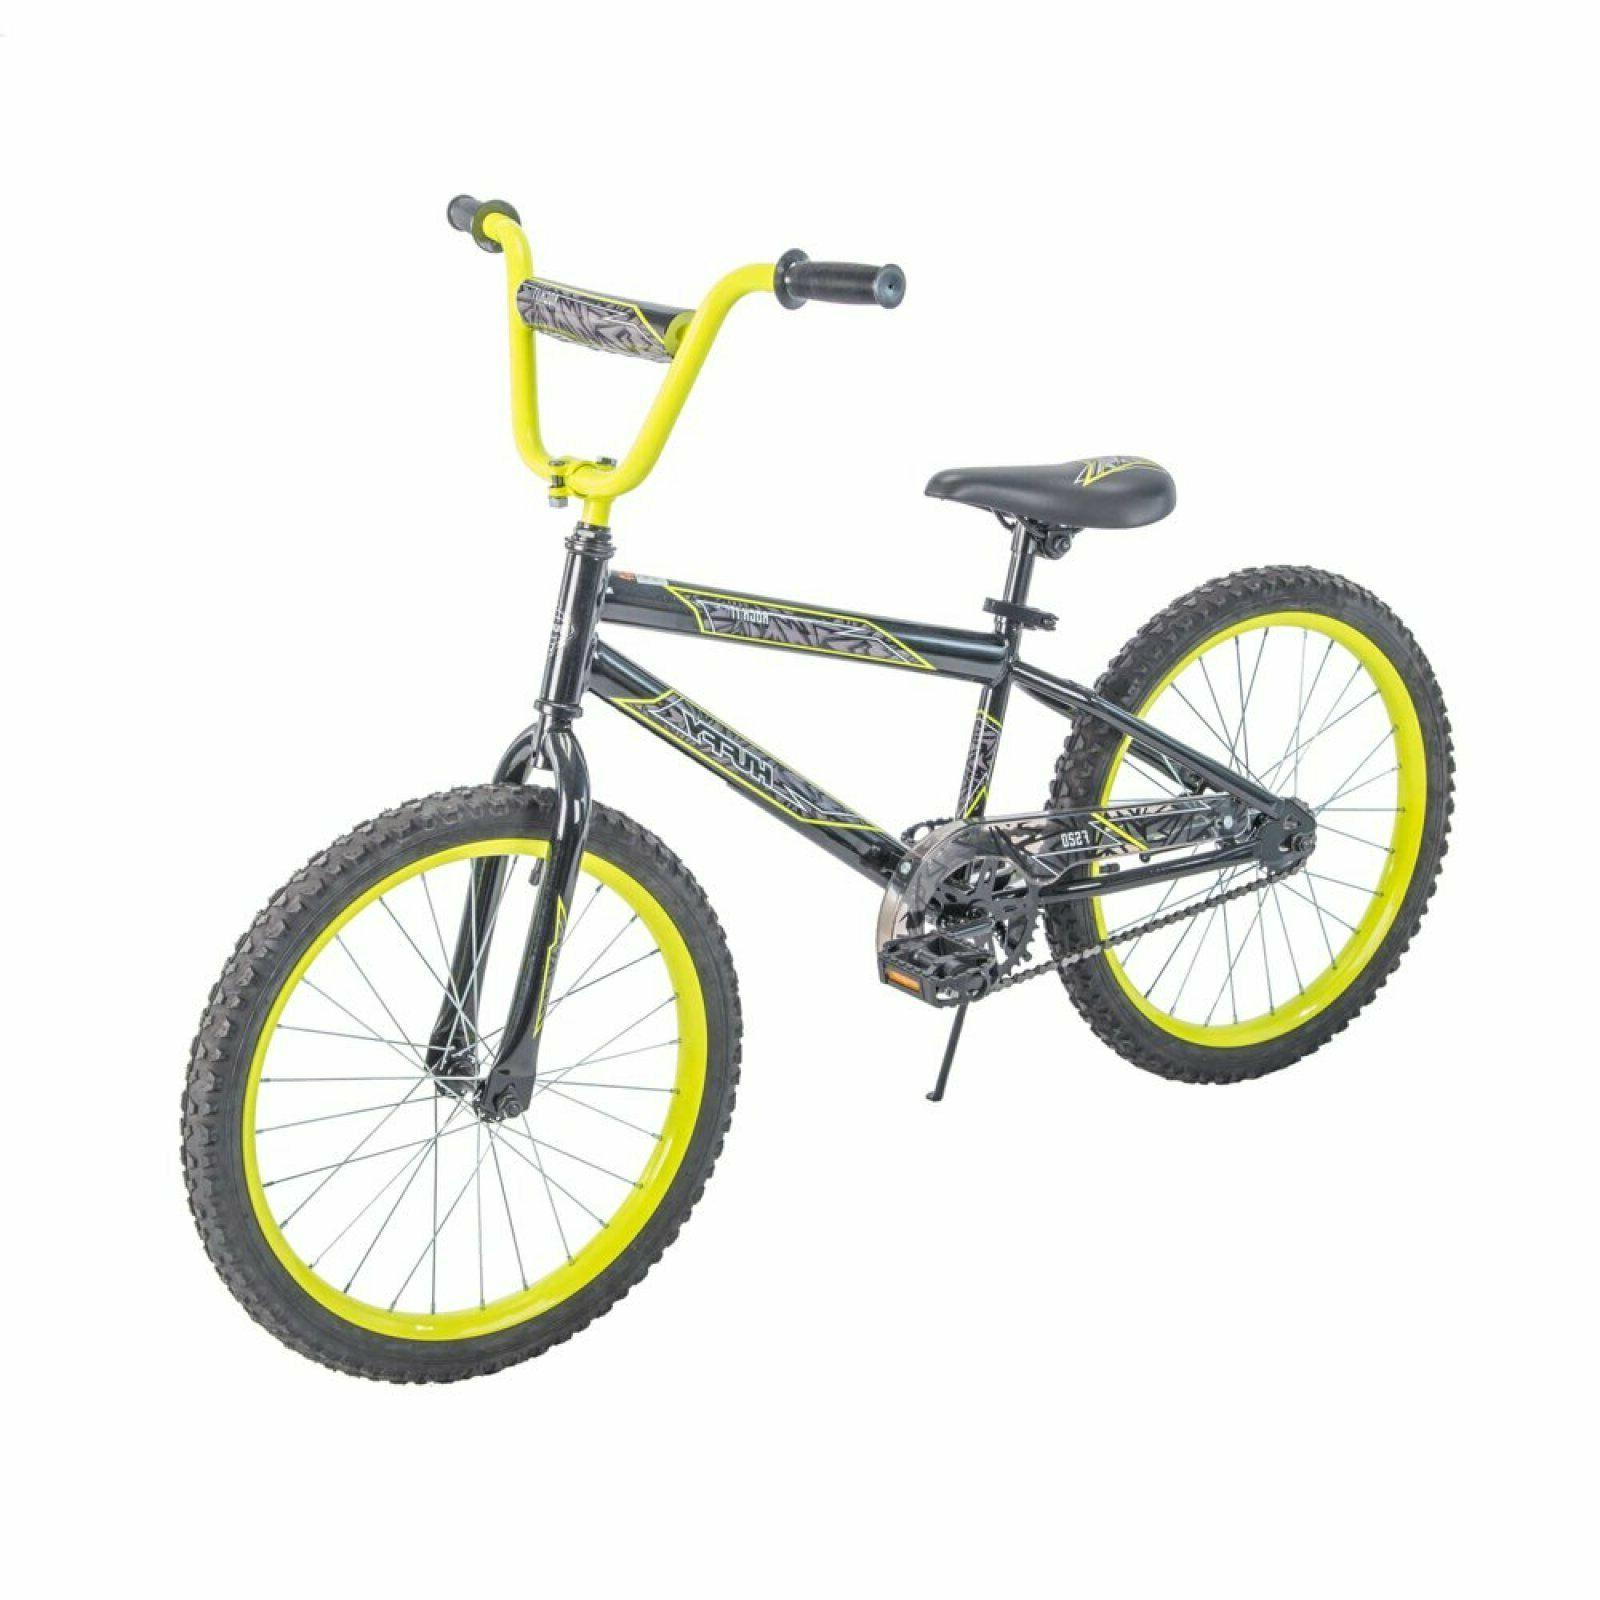 Bmx Bikes For Boys Freestyle 20 Inch 1 Speed Men Steel Frame